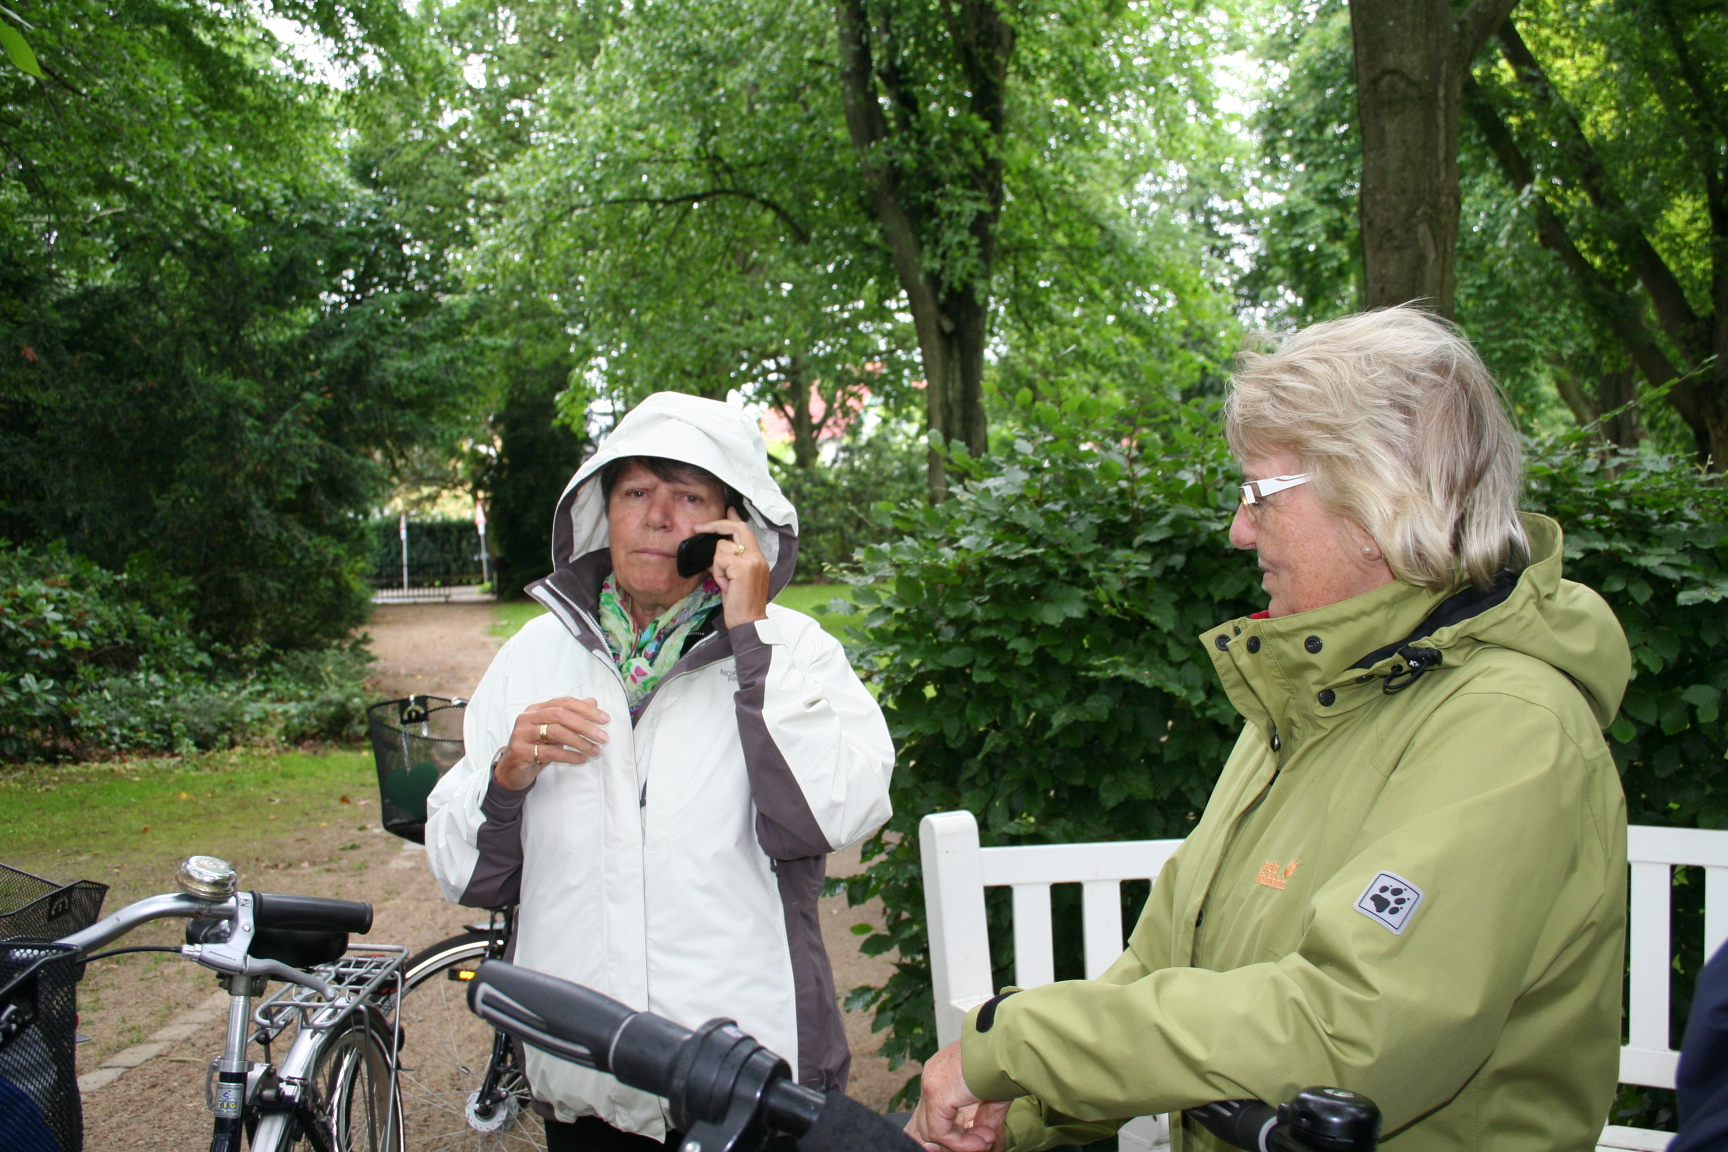 50+ Organisierte die Radtour 2013: Christel Bätker